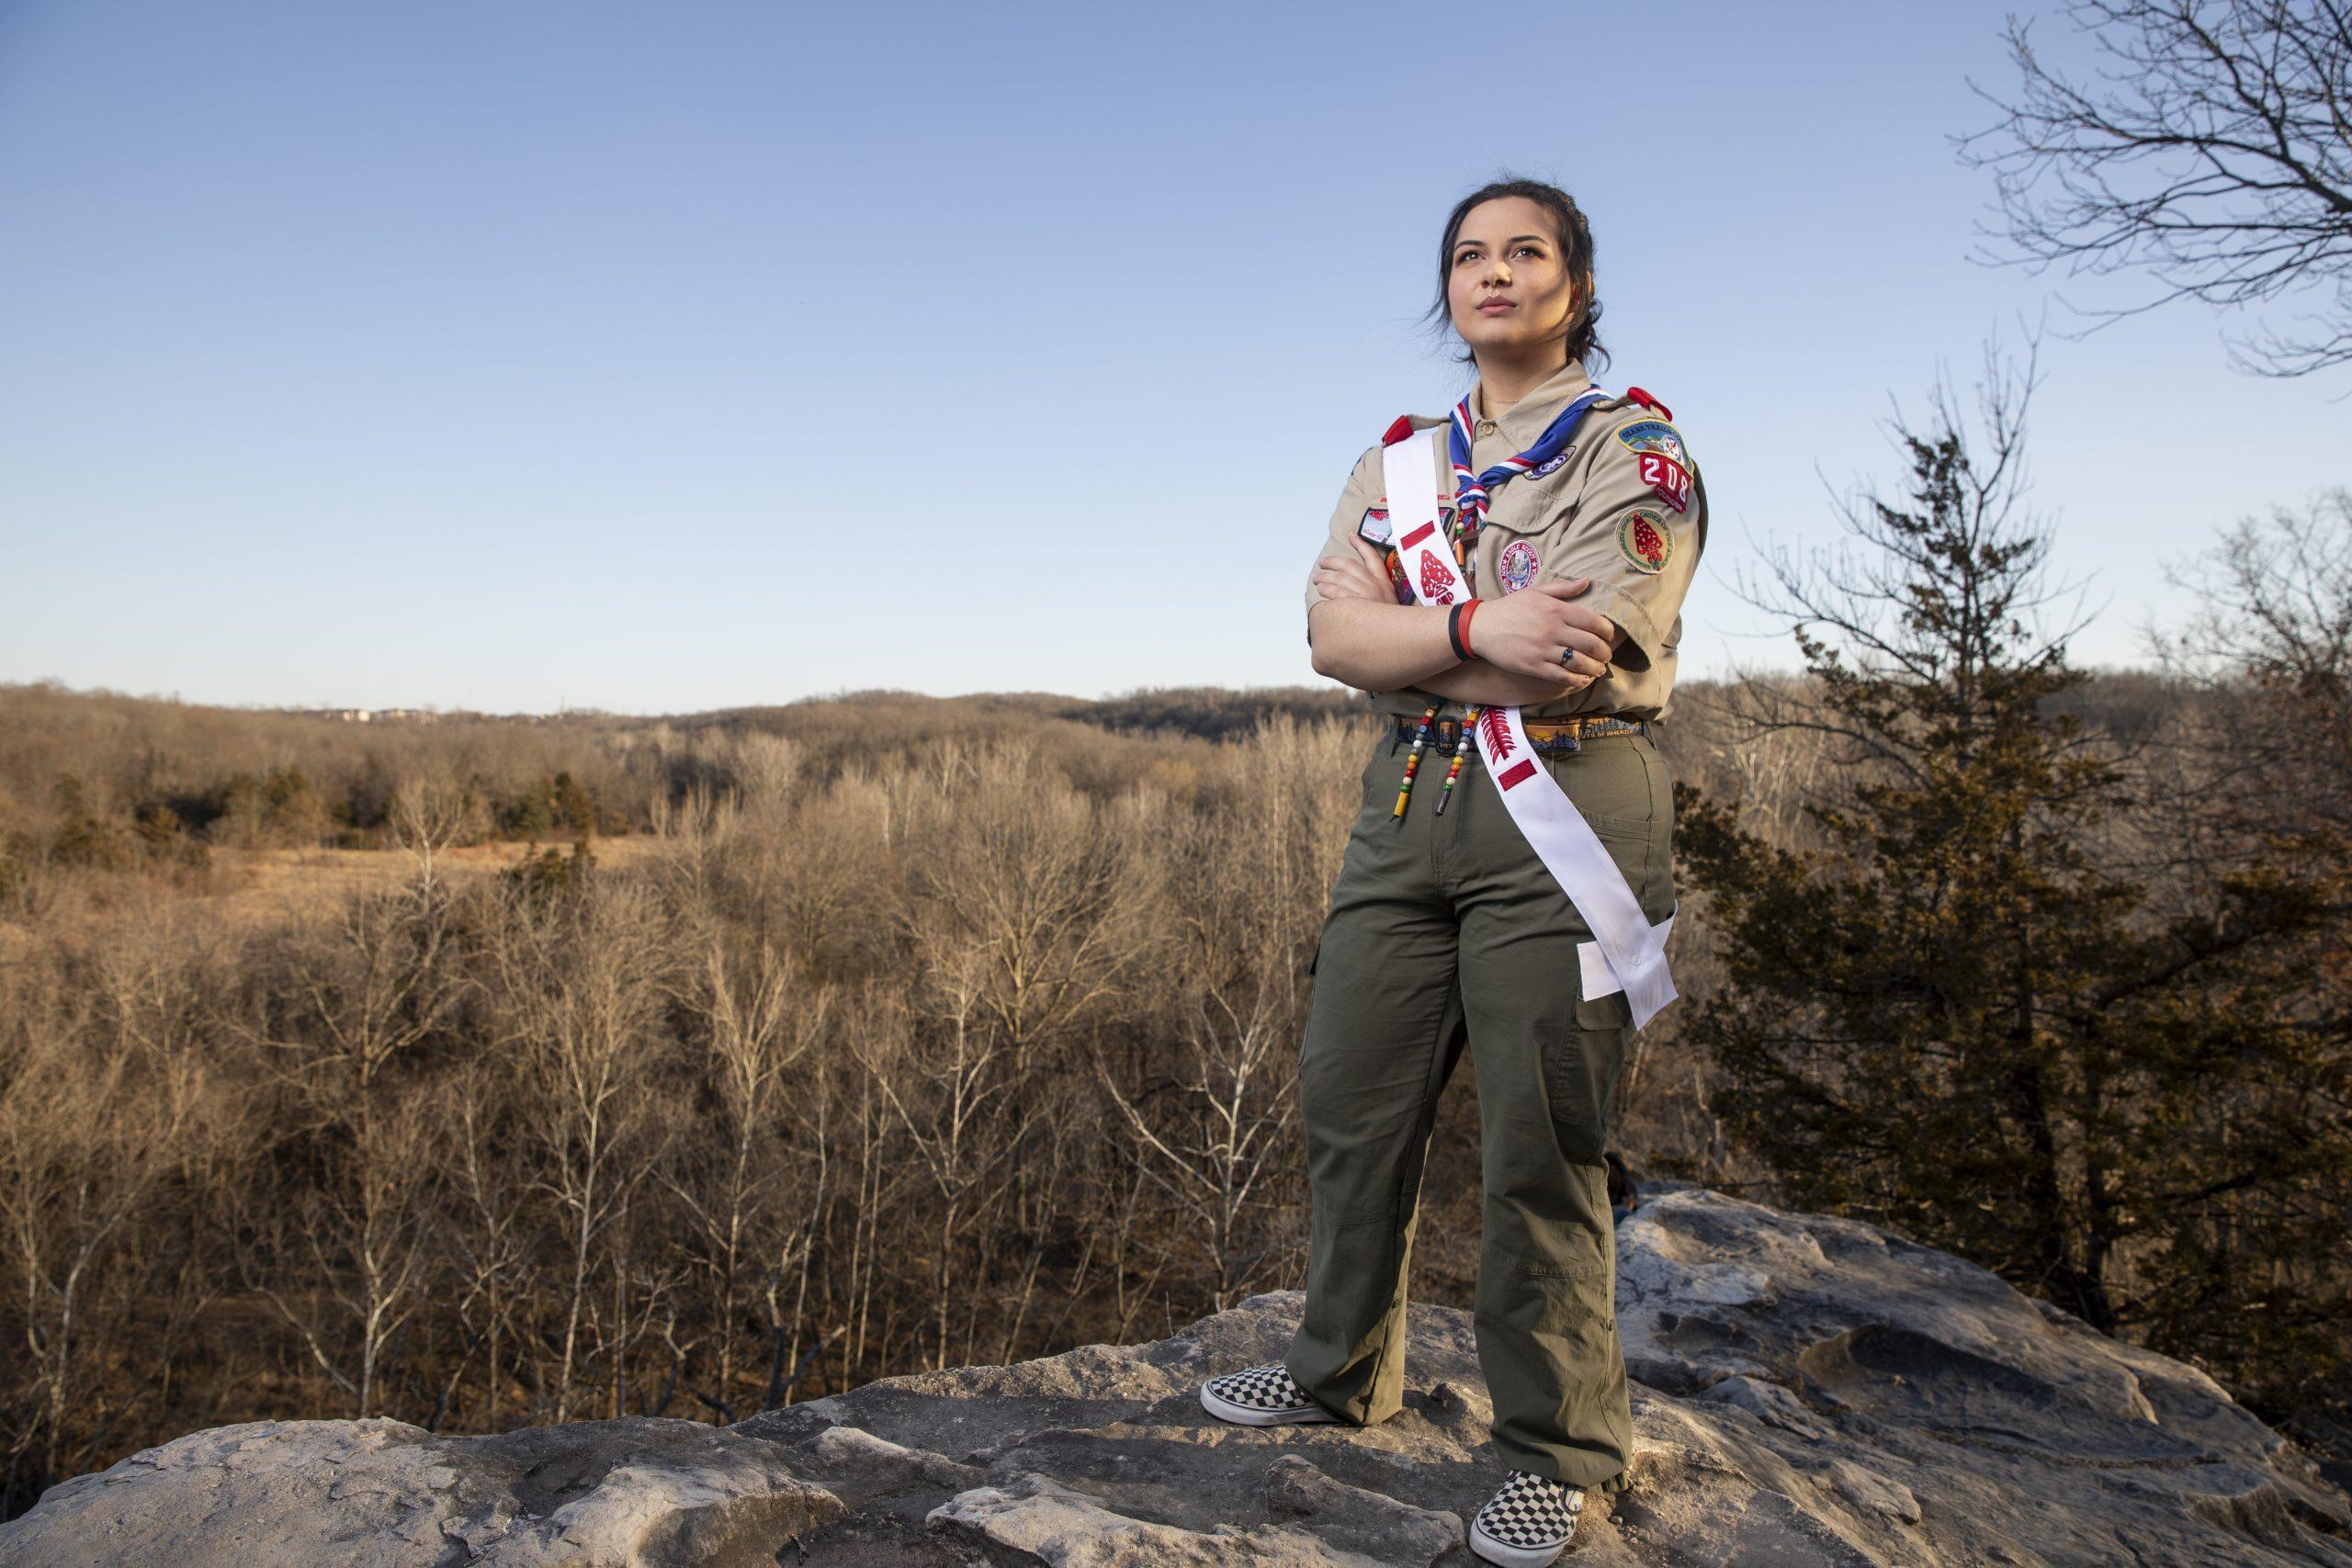 MU Freshman Emily Schmidt is among the inaugural class of female Eagle Scouts.